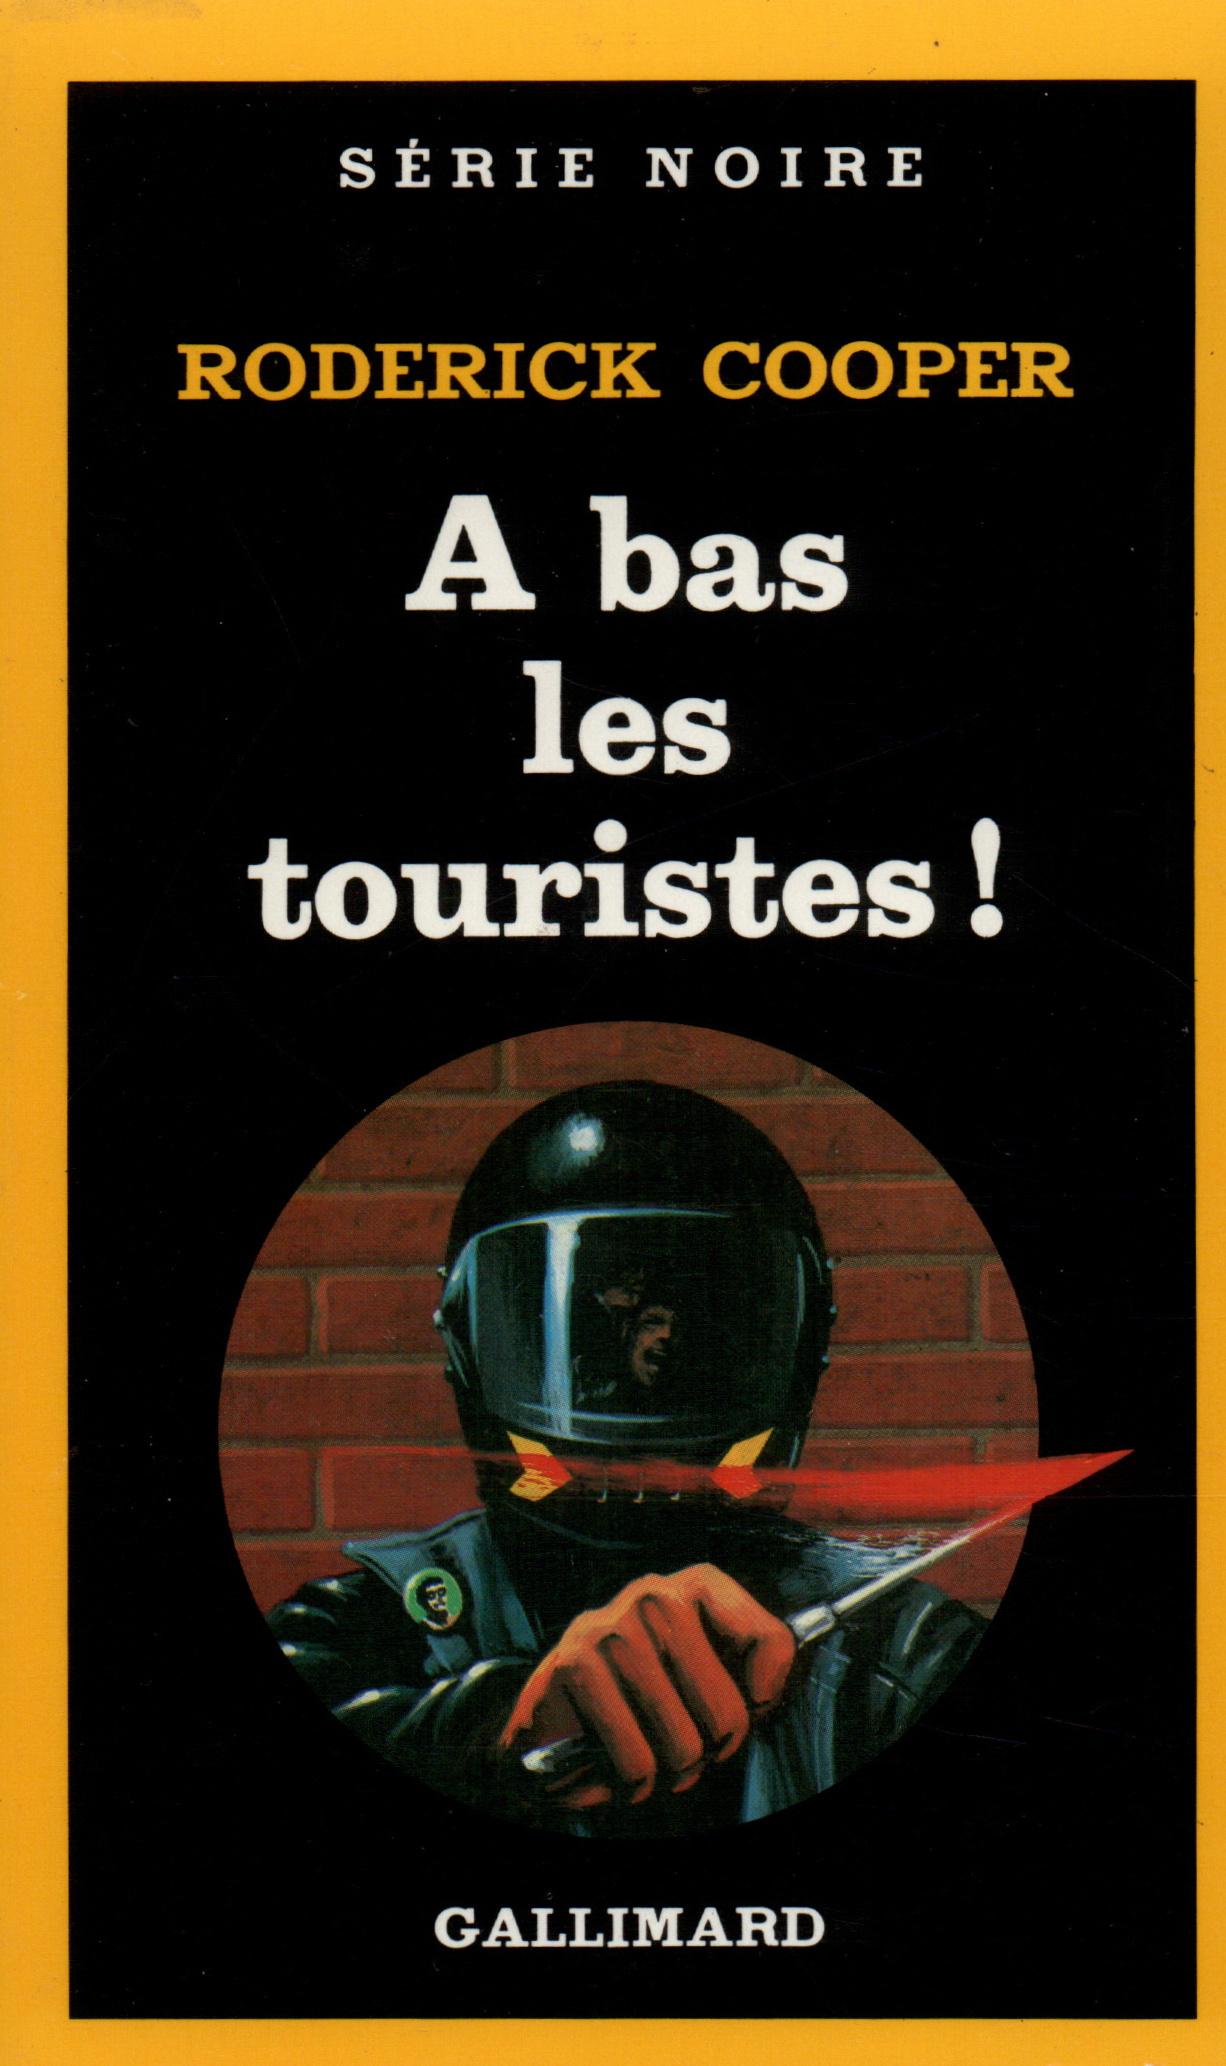 A BAS LES TOURISTES